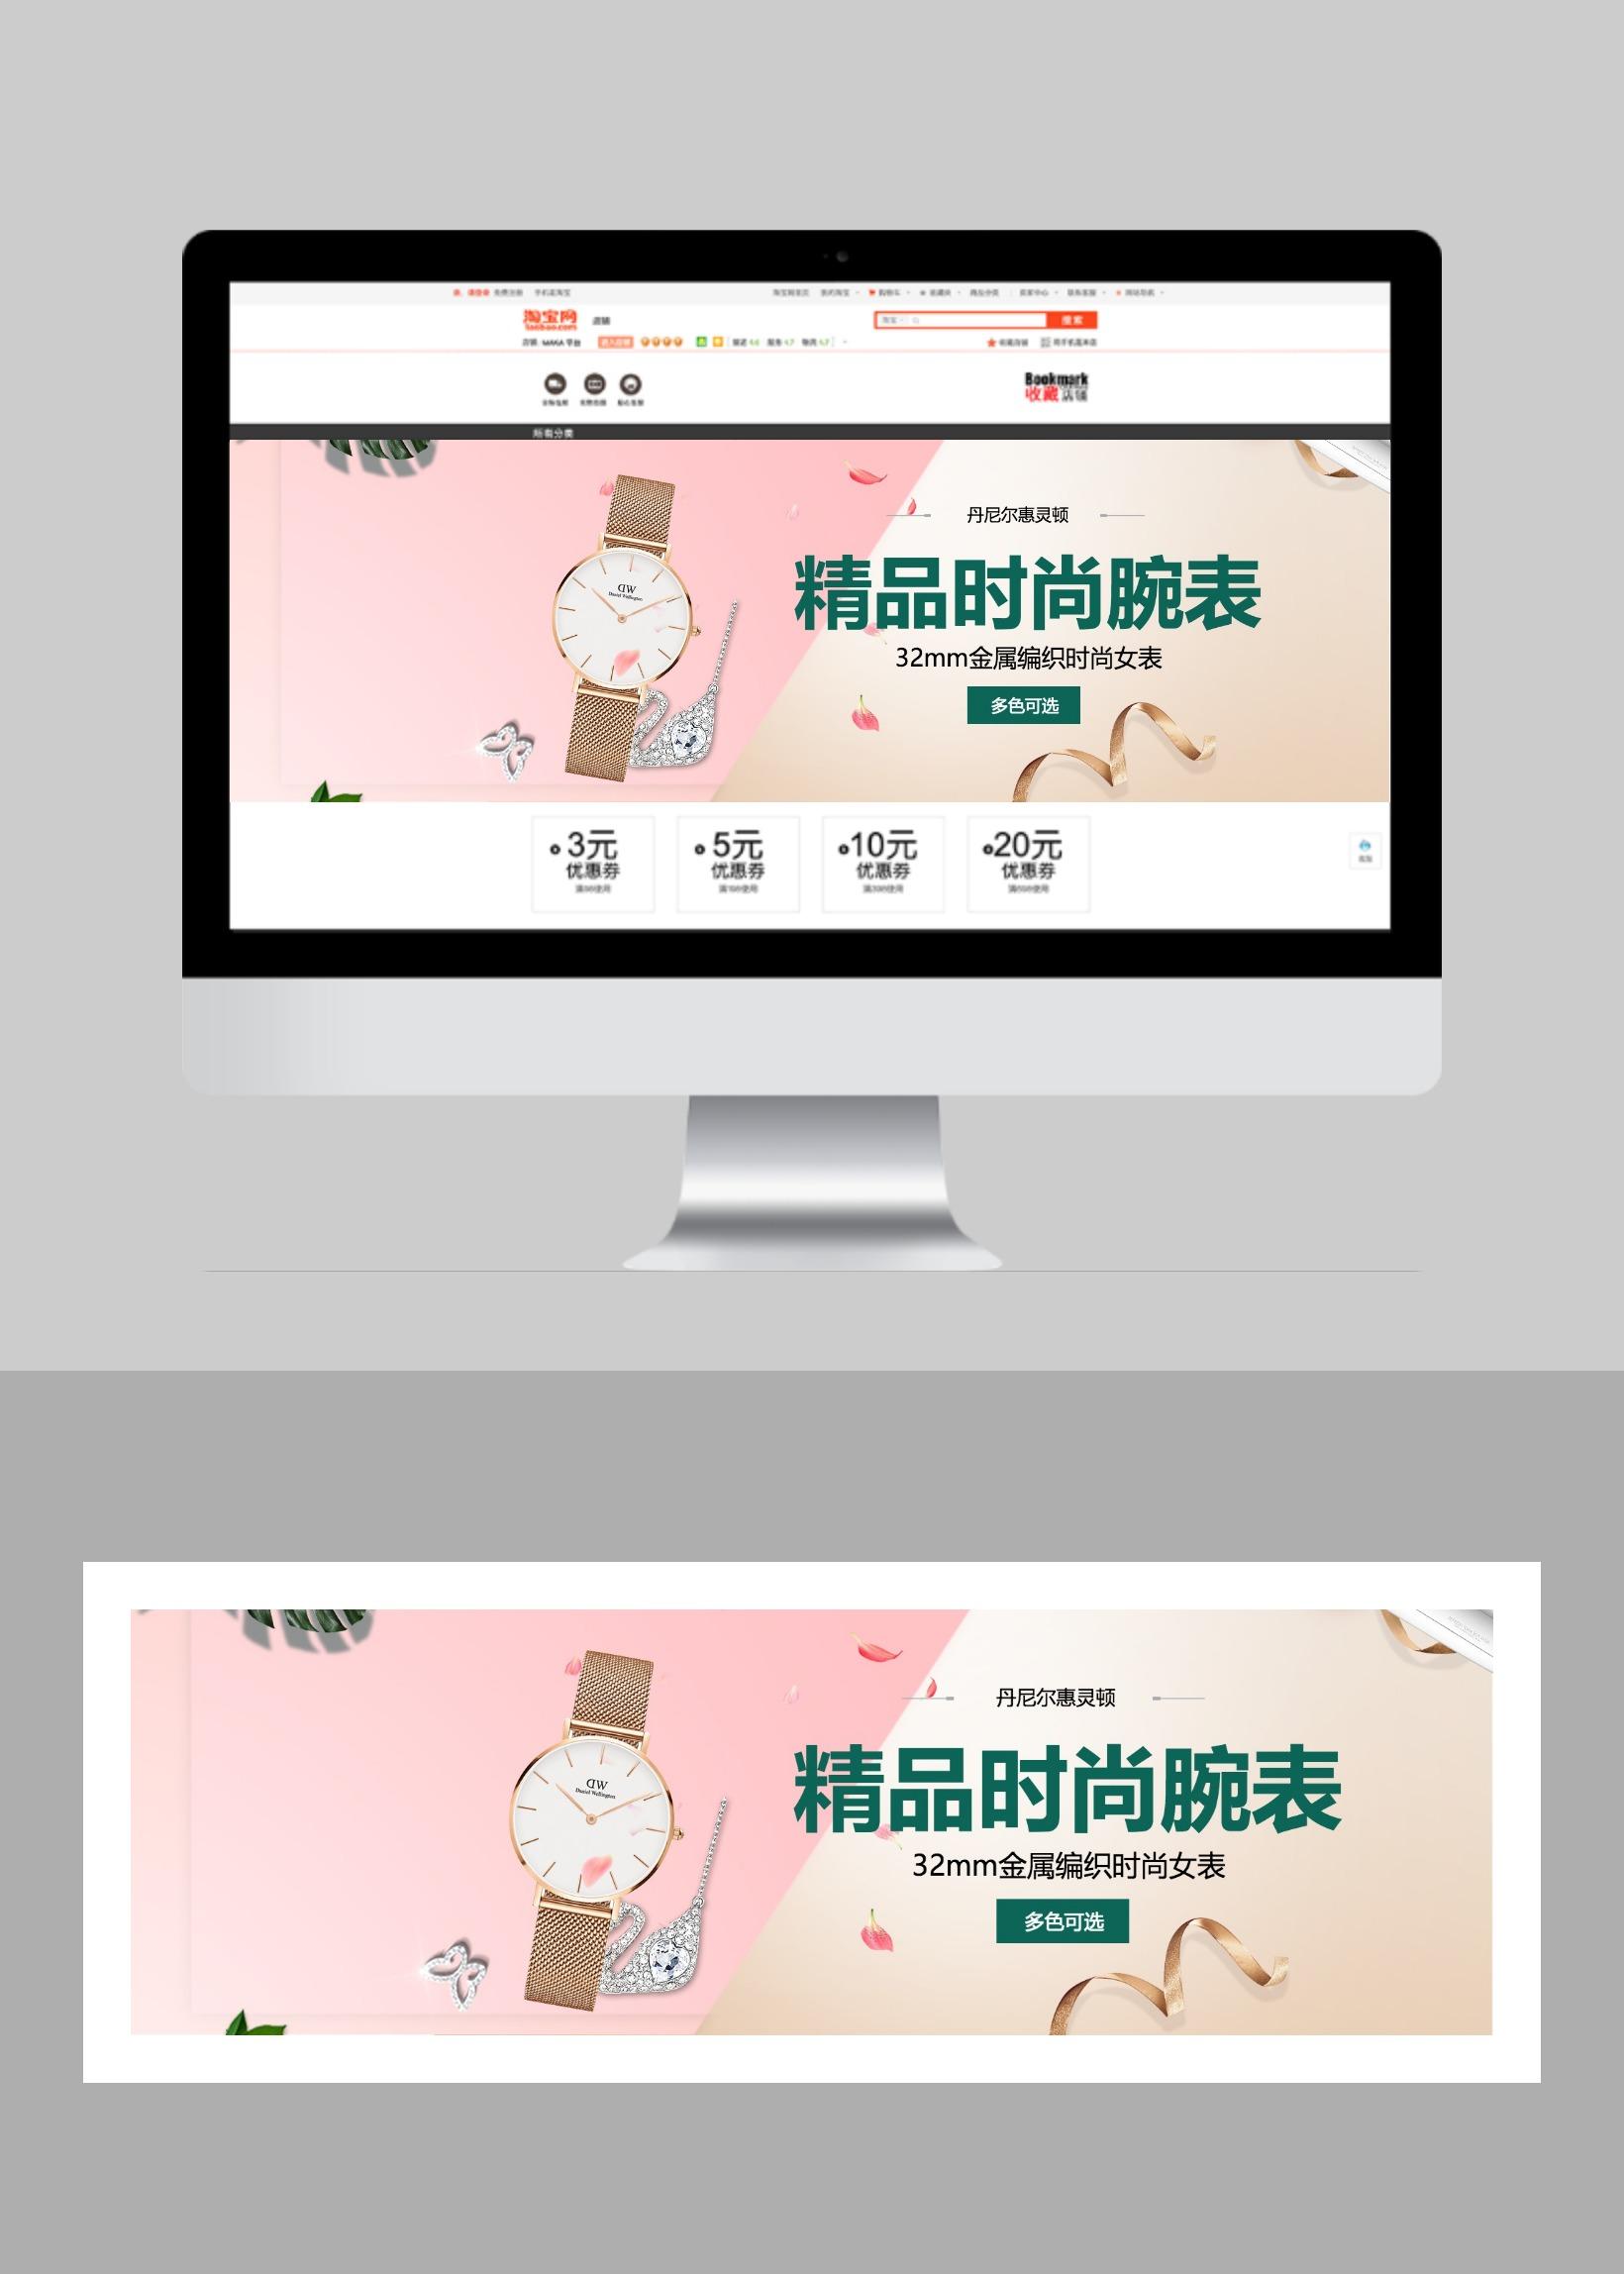 ins风扁平风色DW手表/箱包电商banner